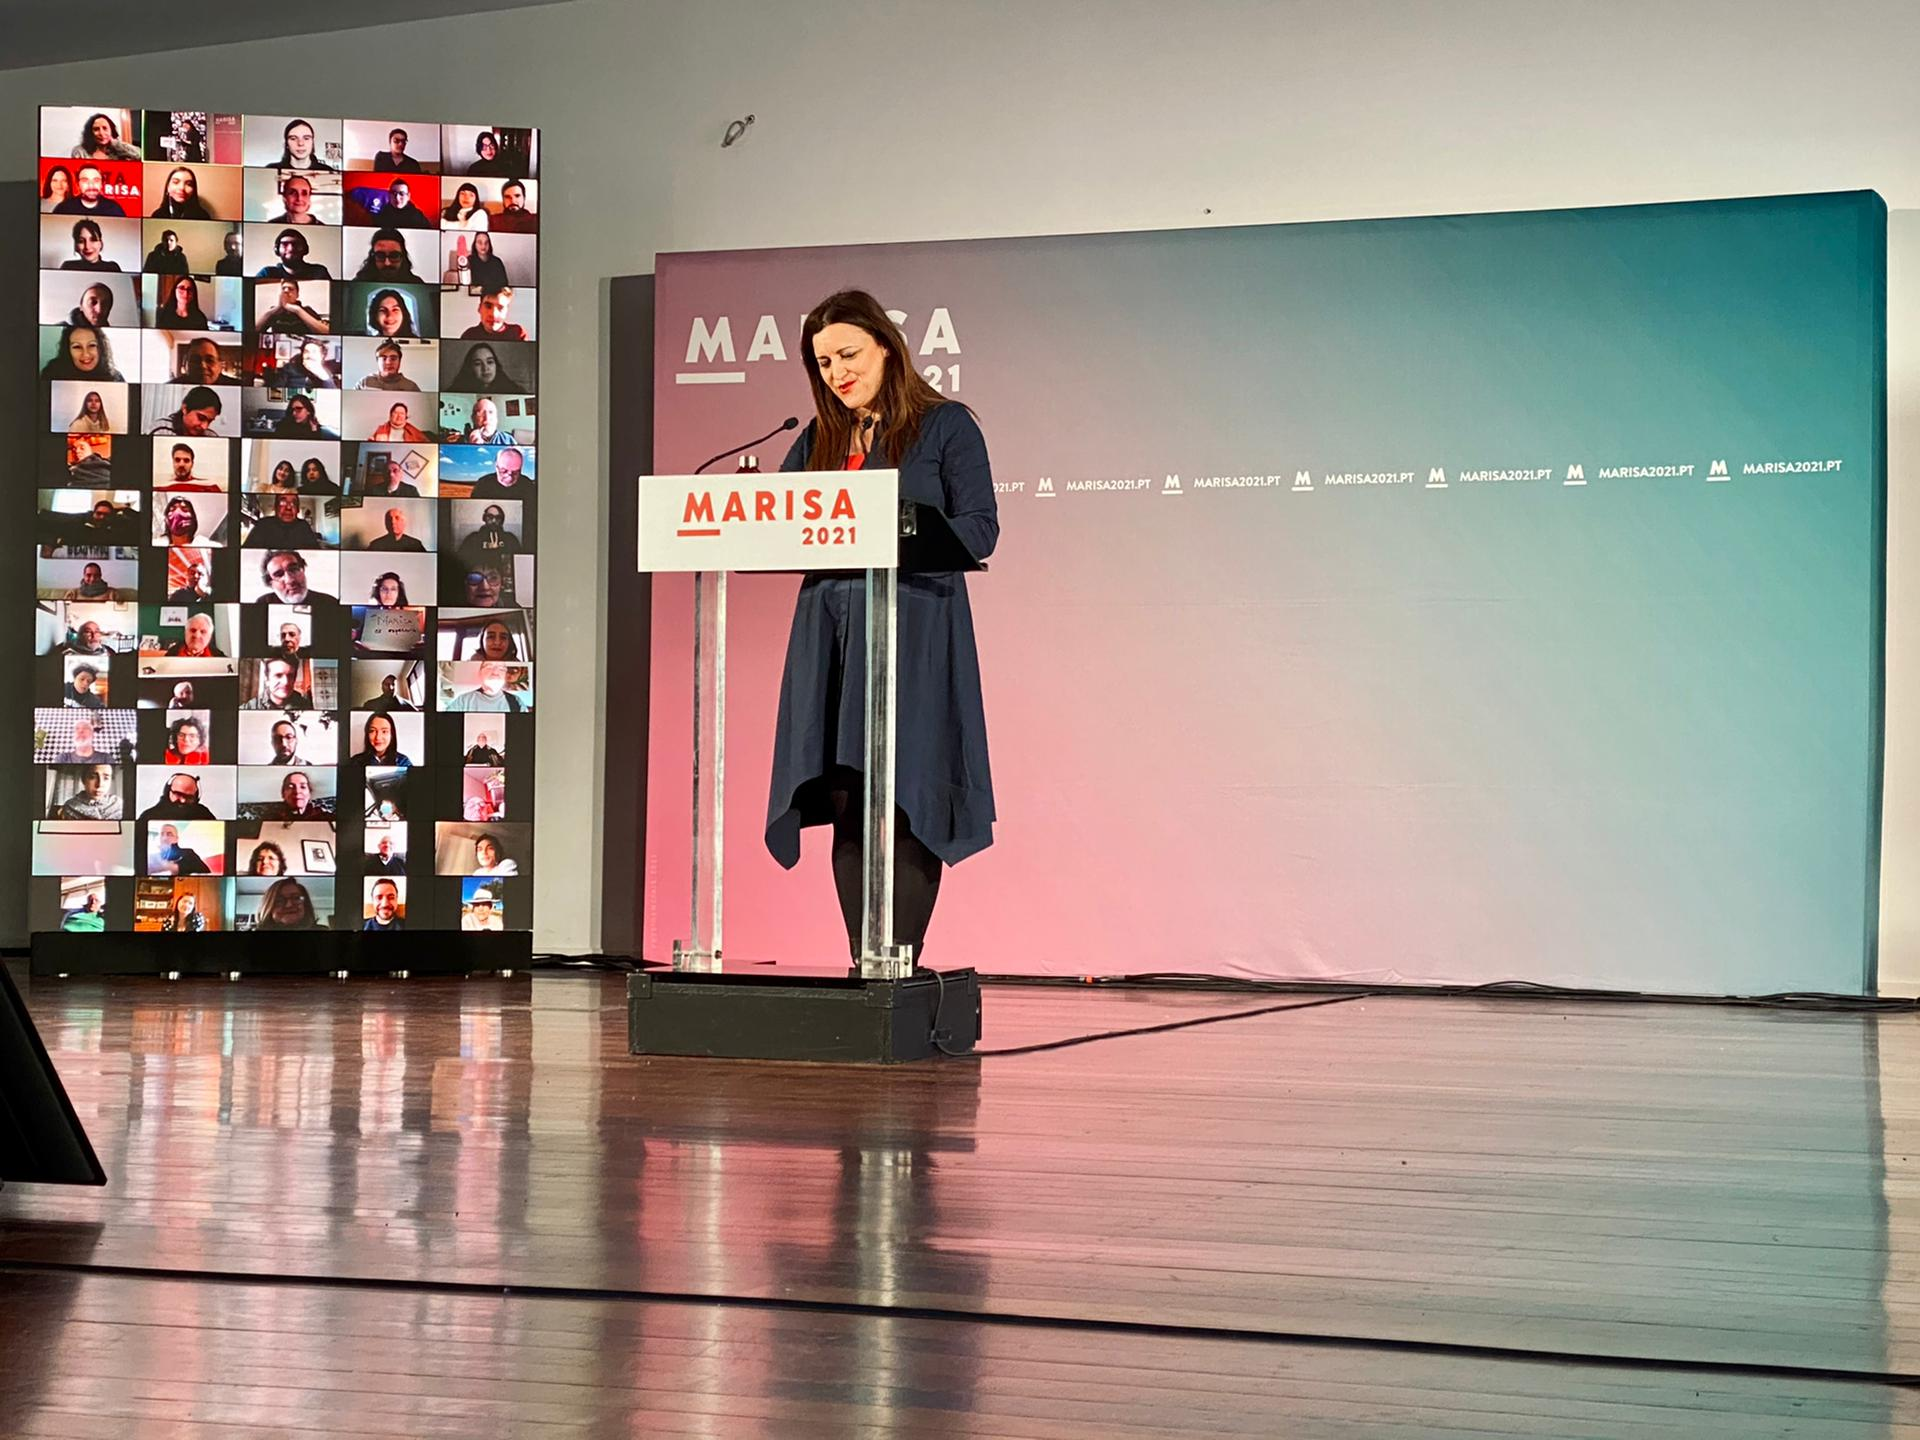 Interior foi tema presente no comício virtual de Marisa Matias desde Viseu